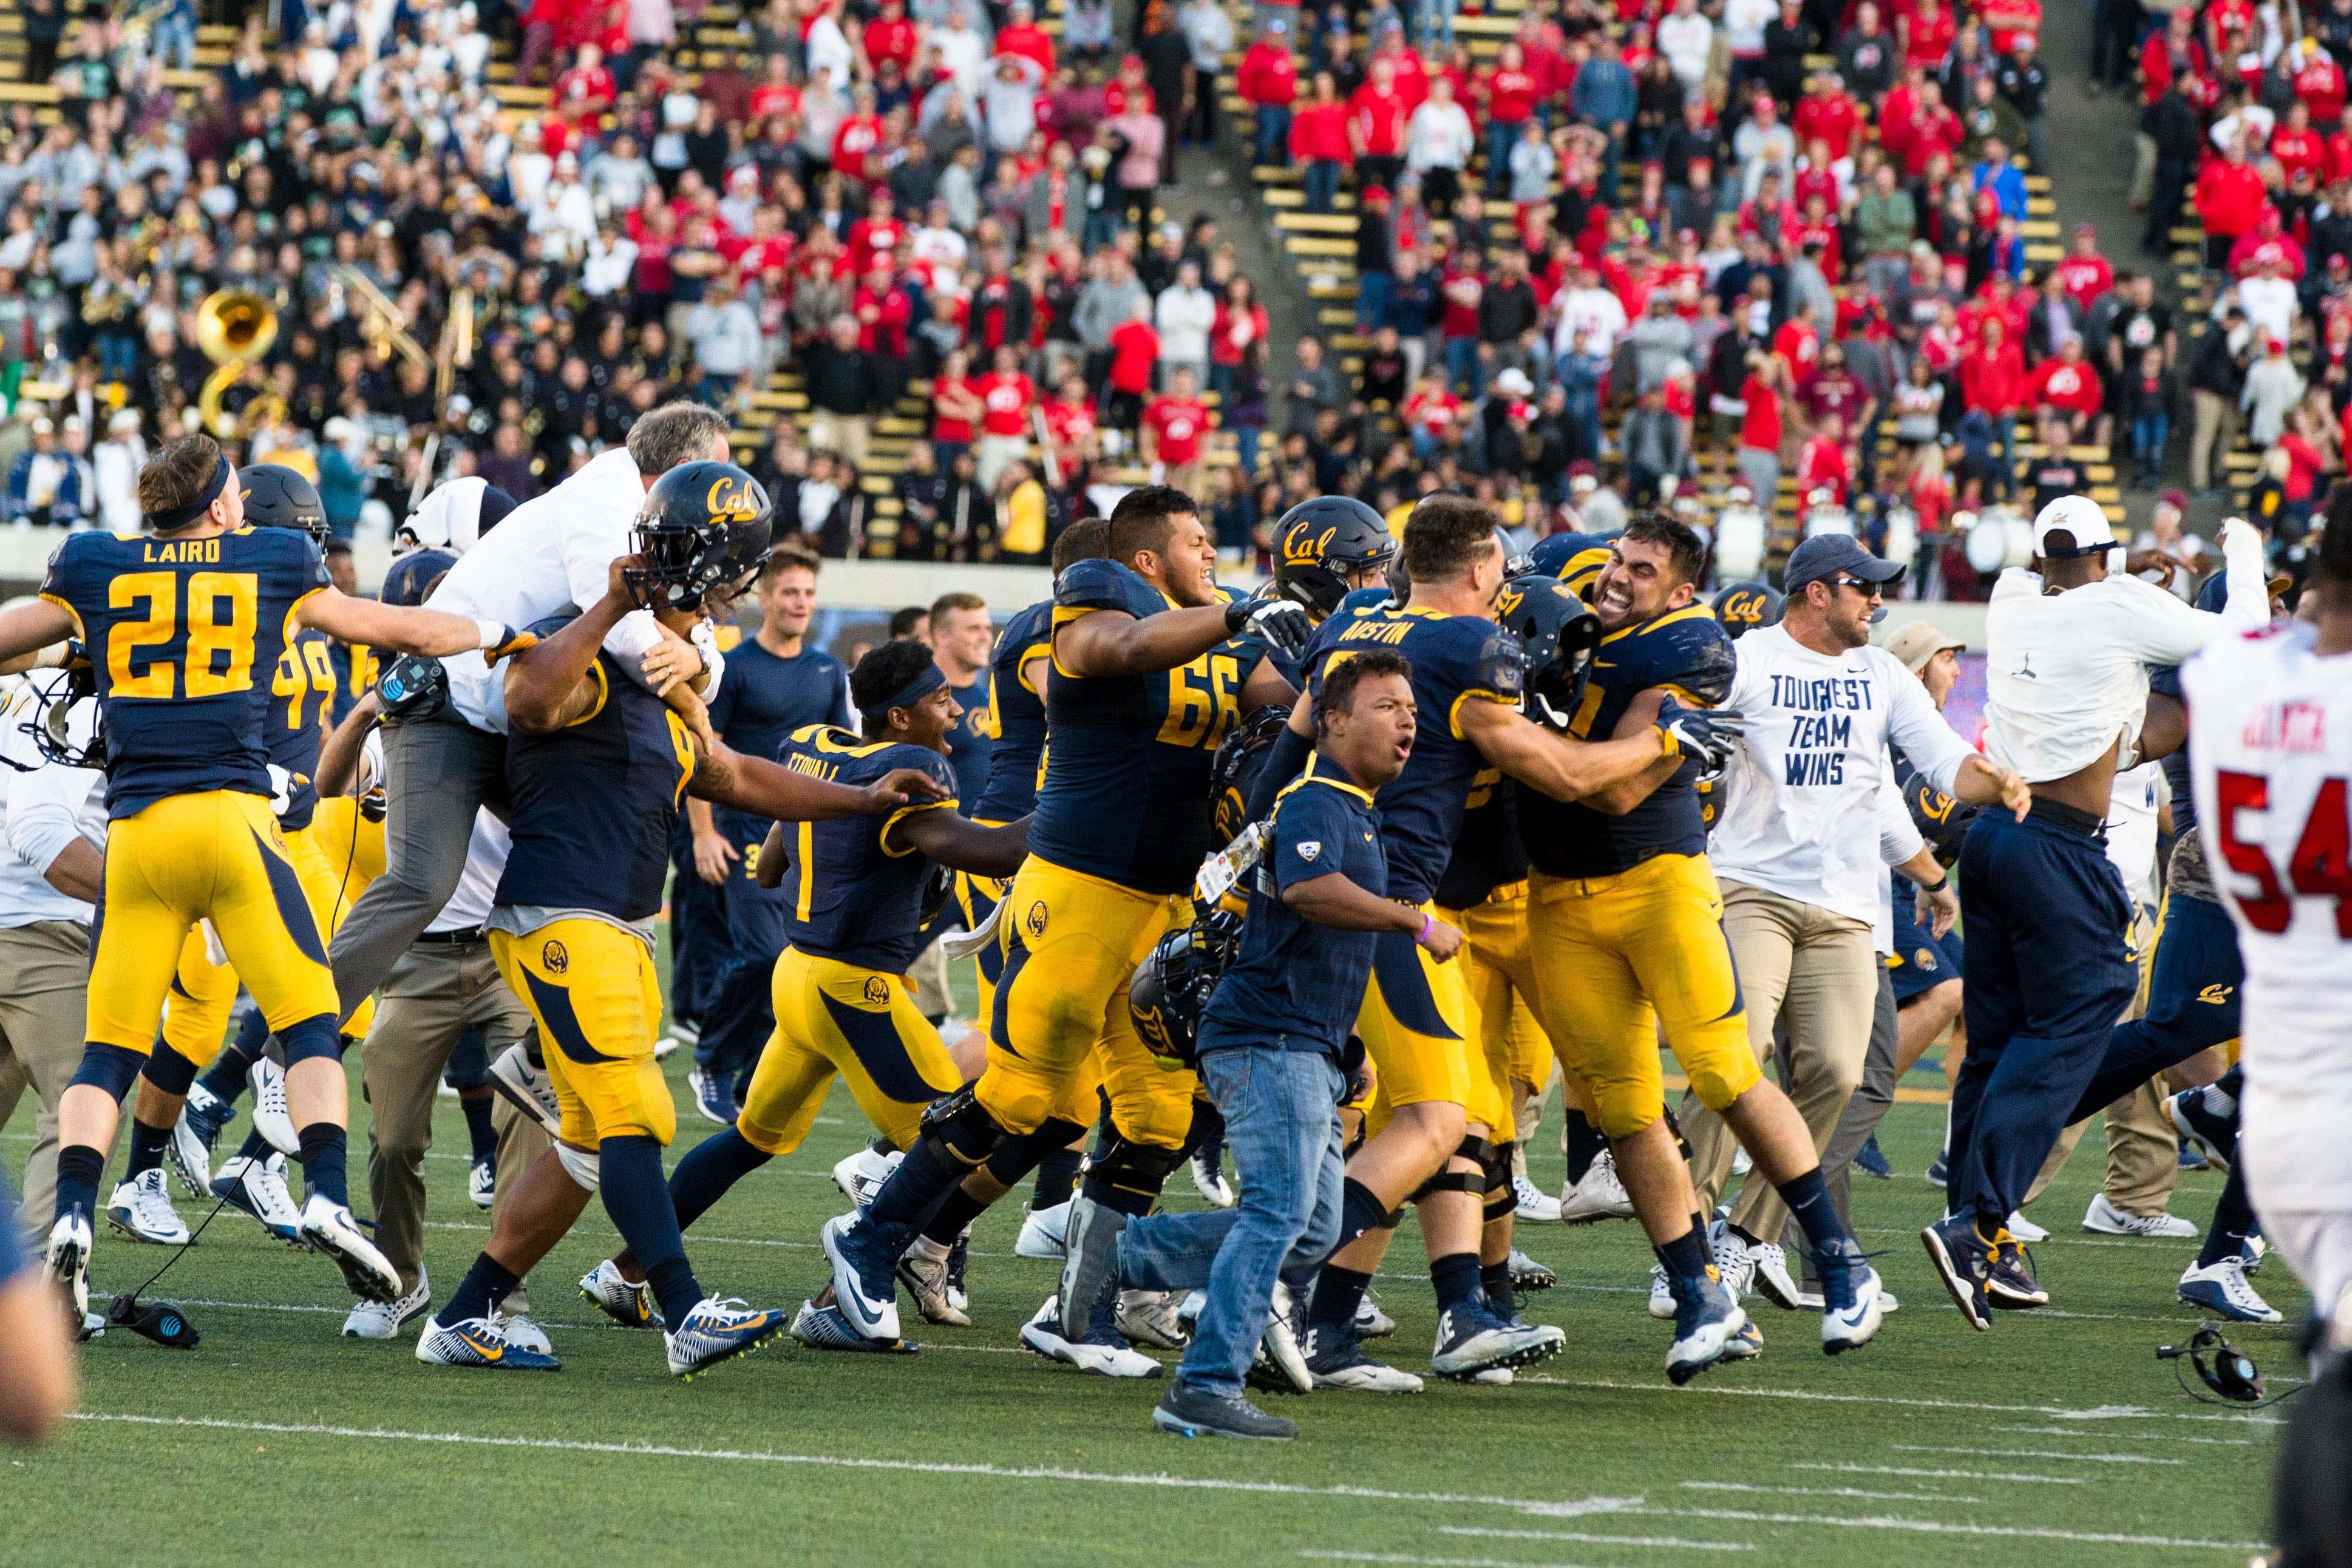 NCAA Football: Utah at California